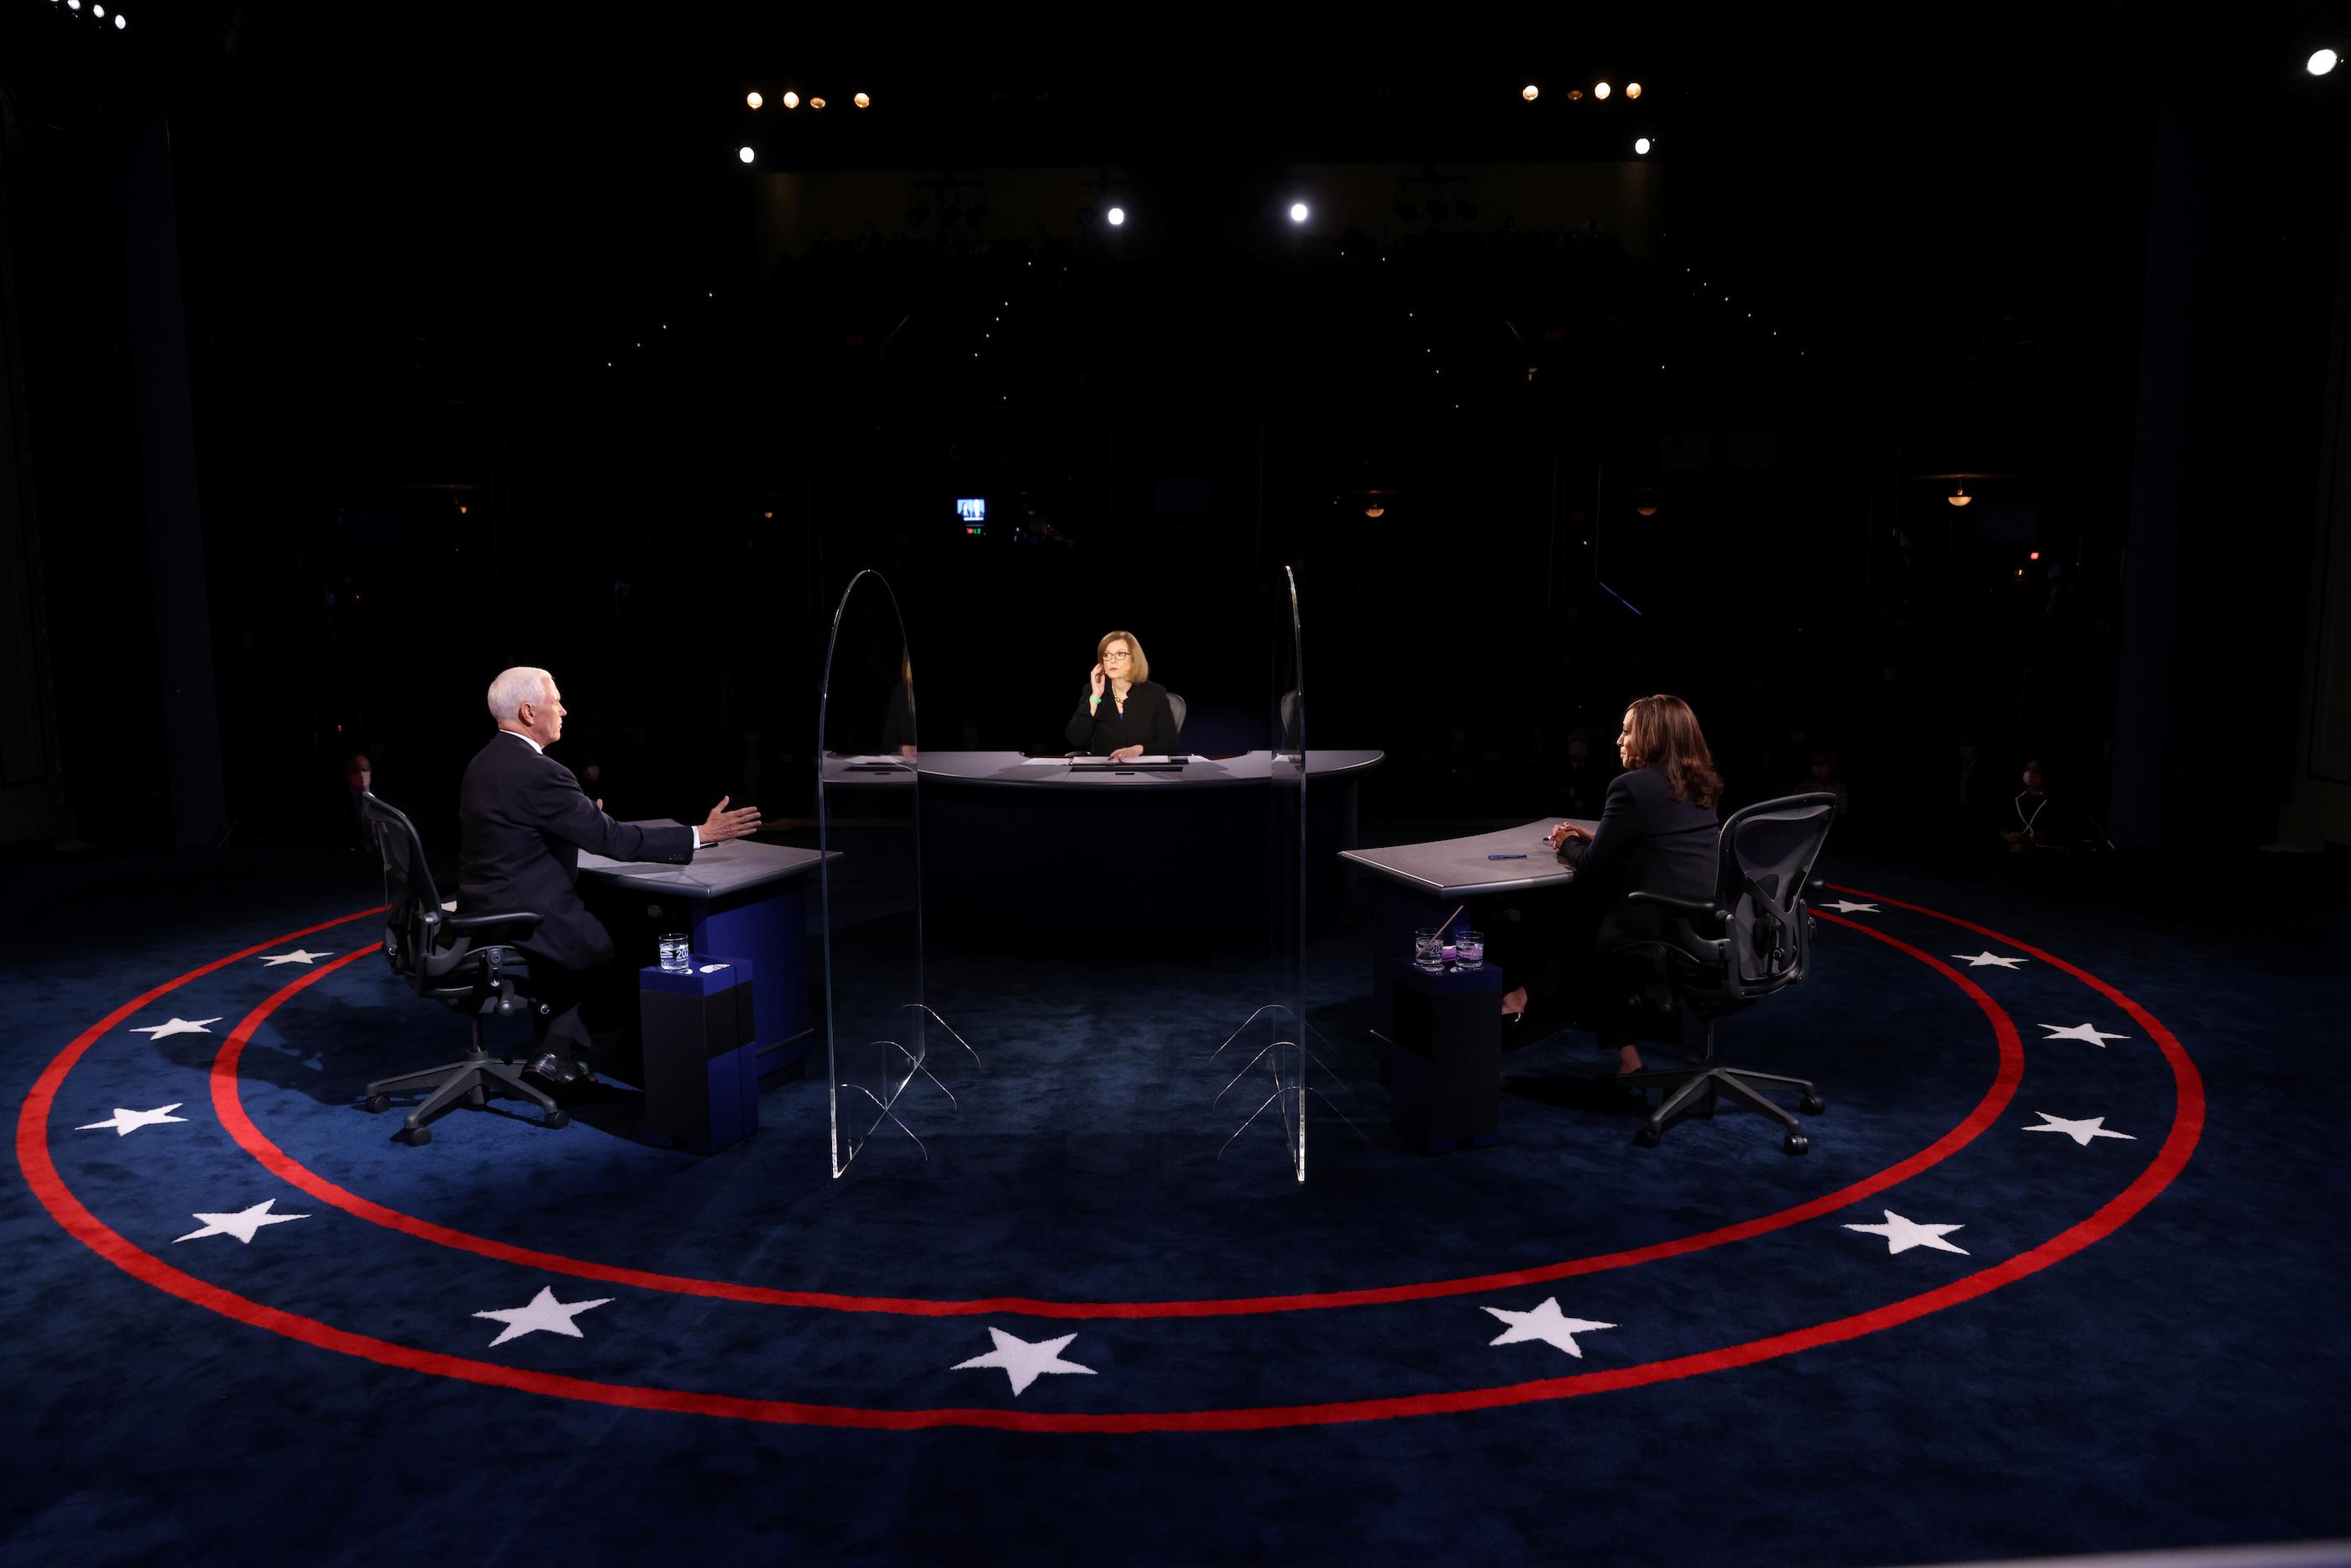 Harris vs. Pence: The 2020 vice presidential debate